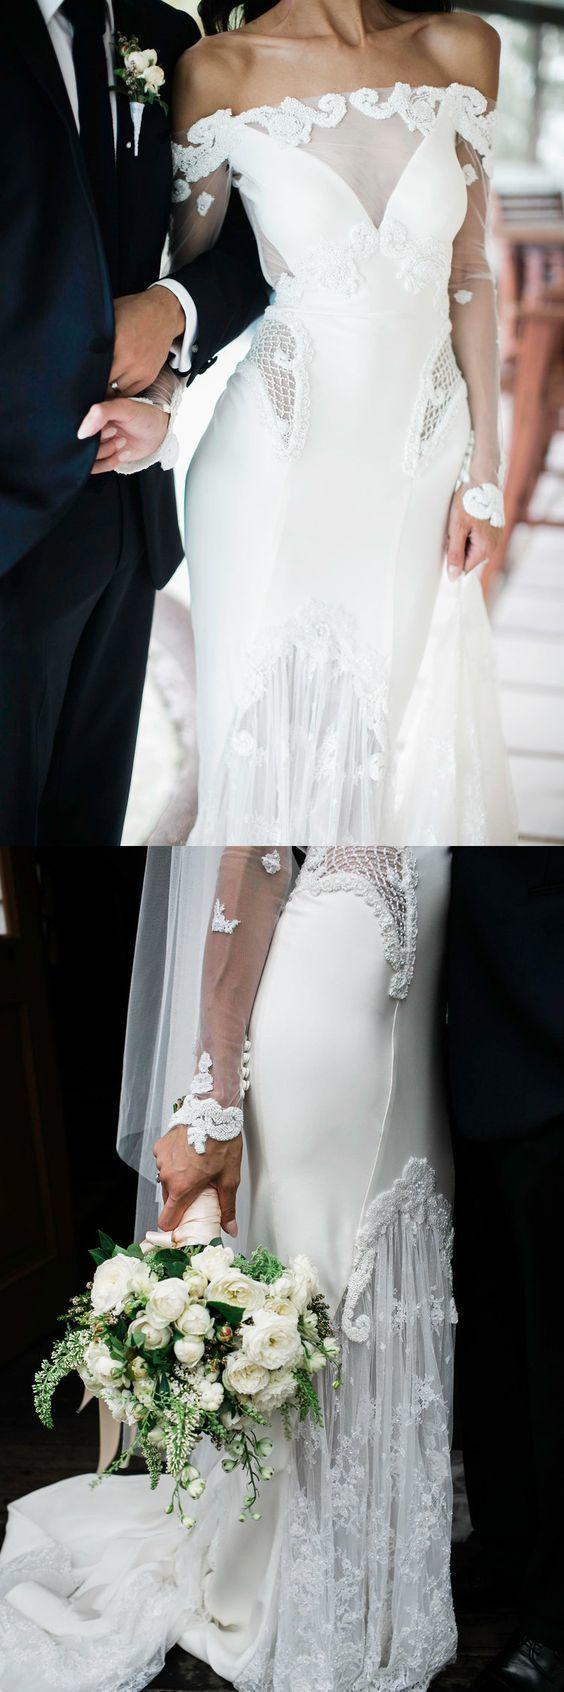 Long sleeve lace wedding dress mermaid  Mermaid OfftheShoulder Long Sleeves Court Train Wedding Dress with